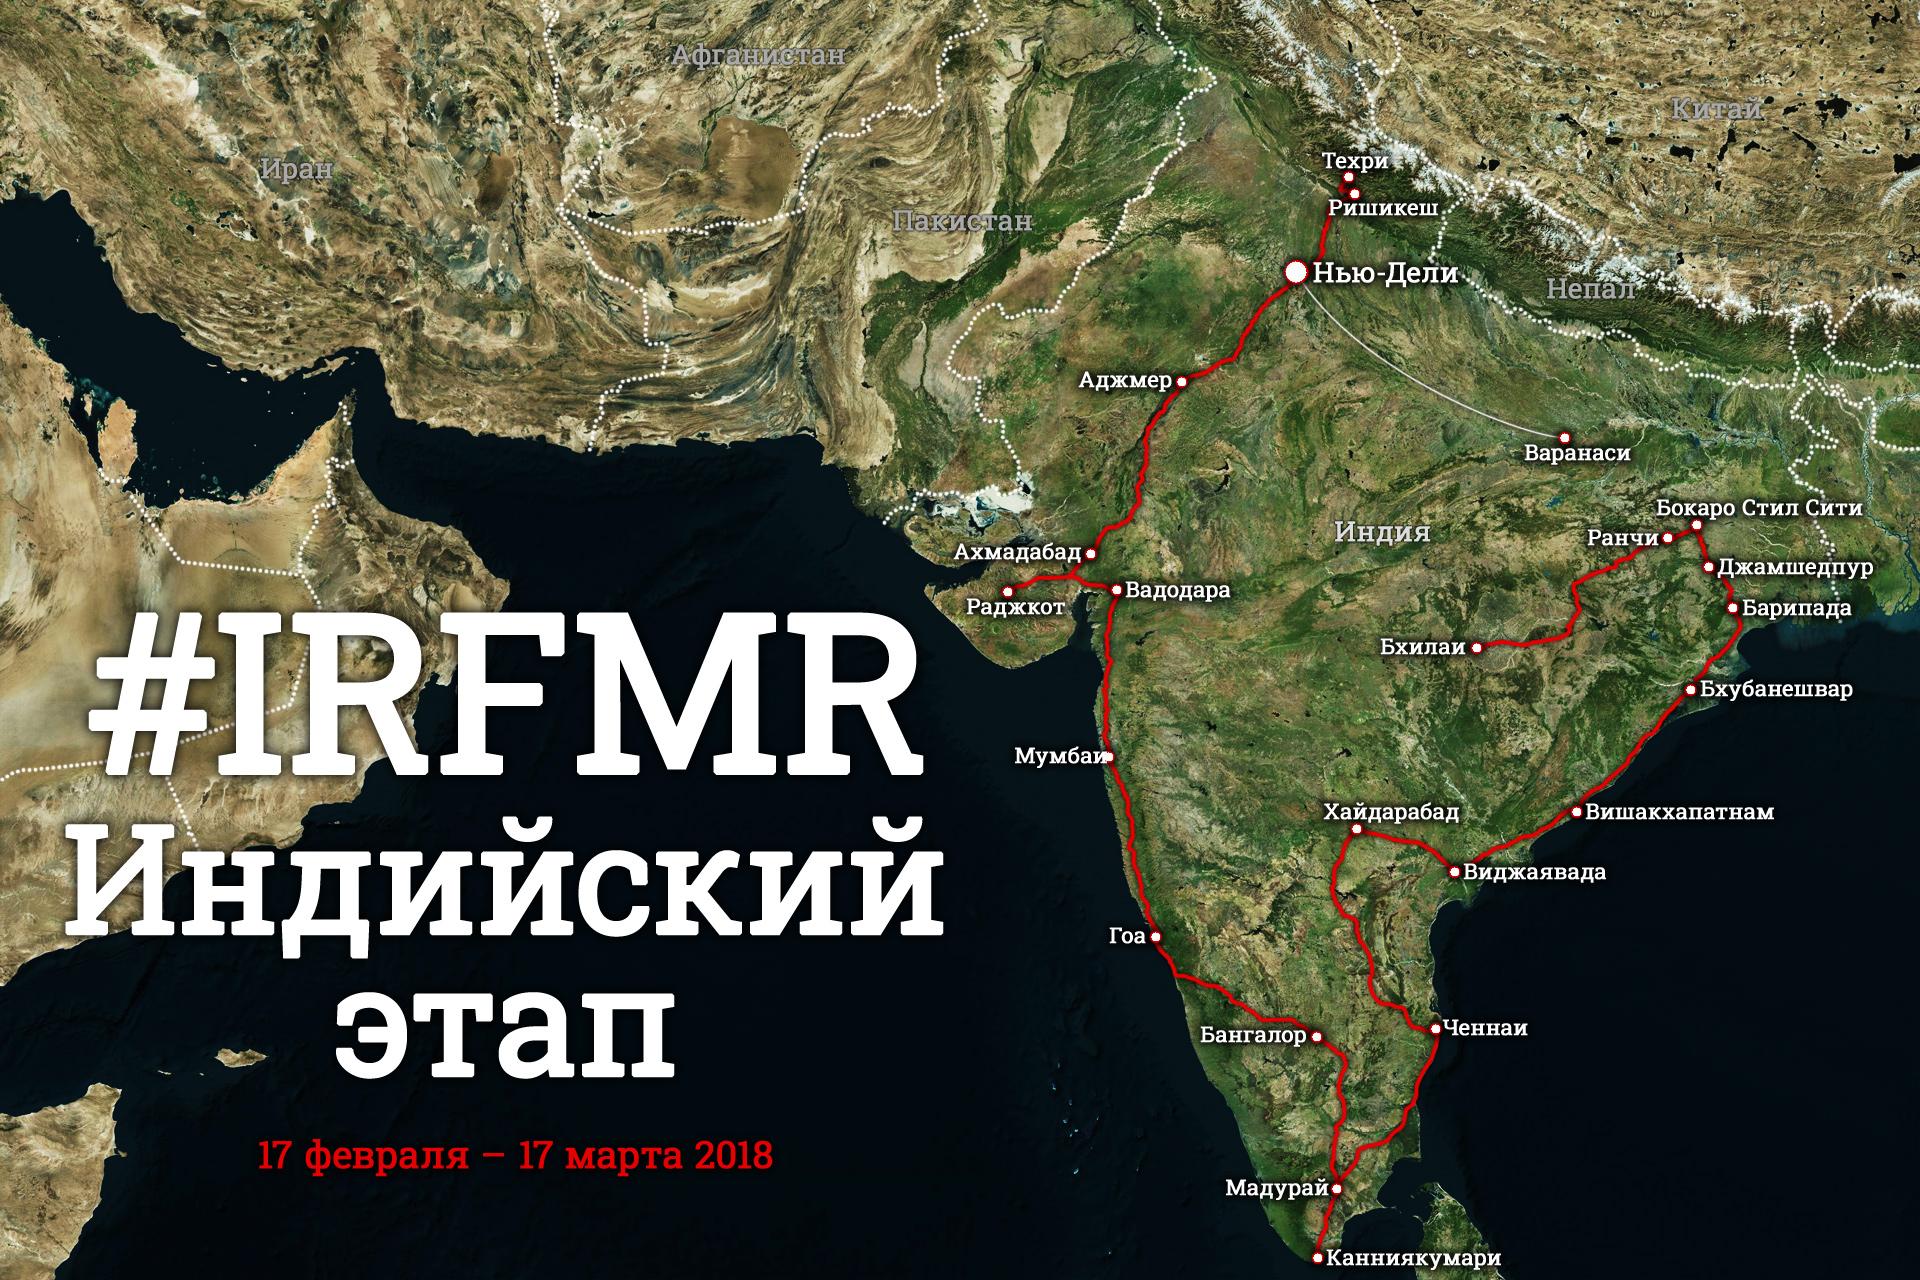 #IRFMR. Индийский этап